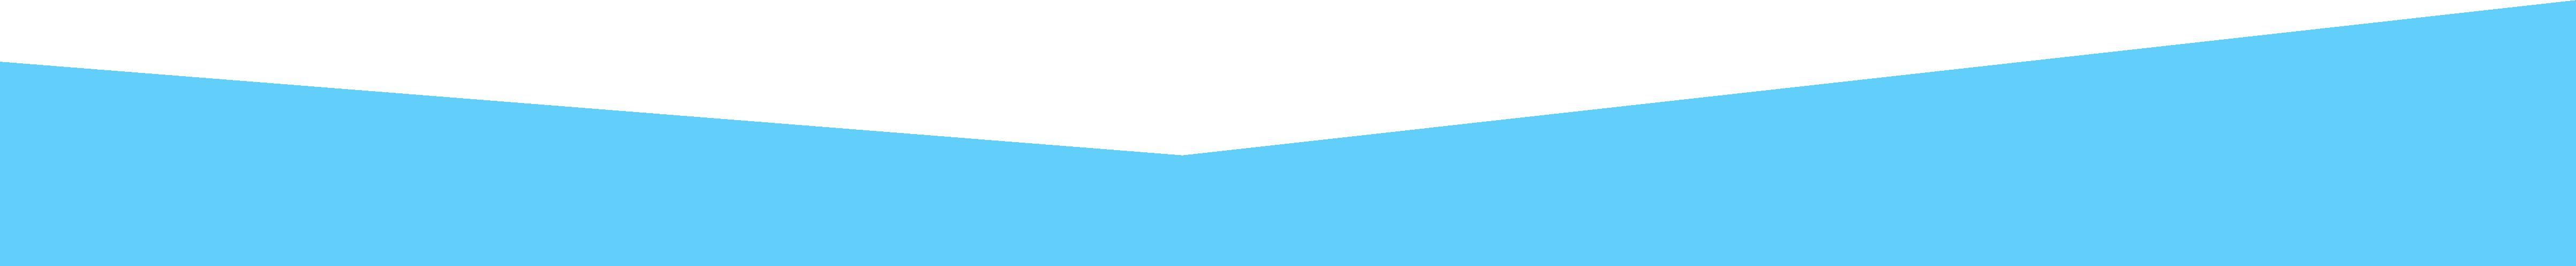 trianglesTop